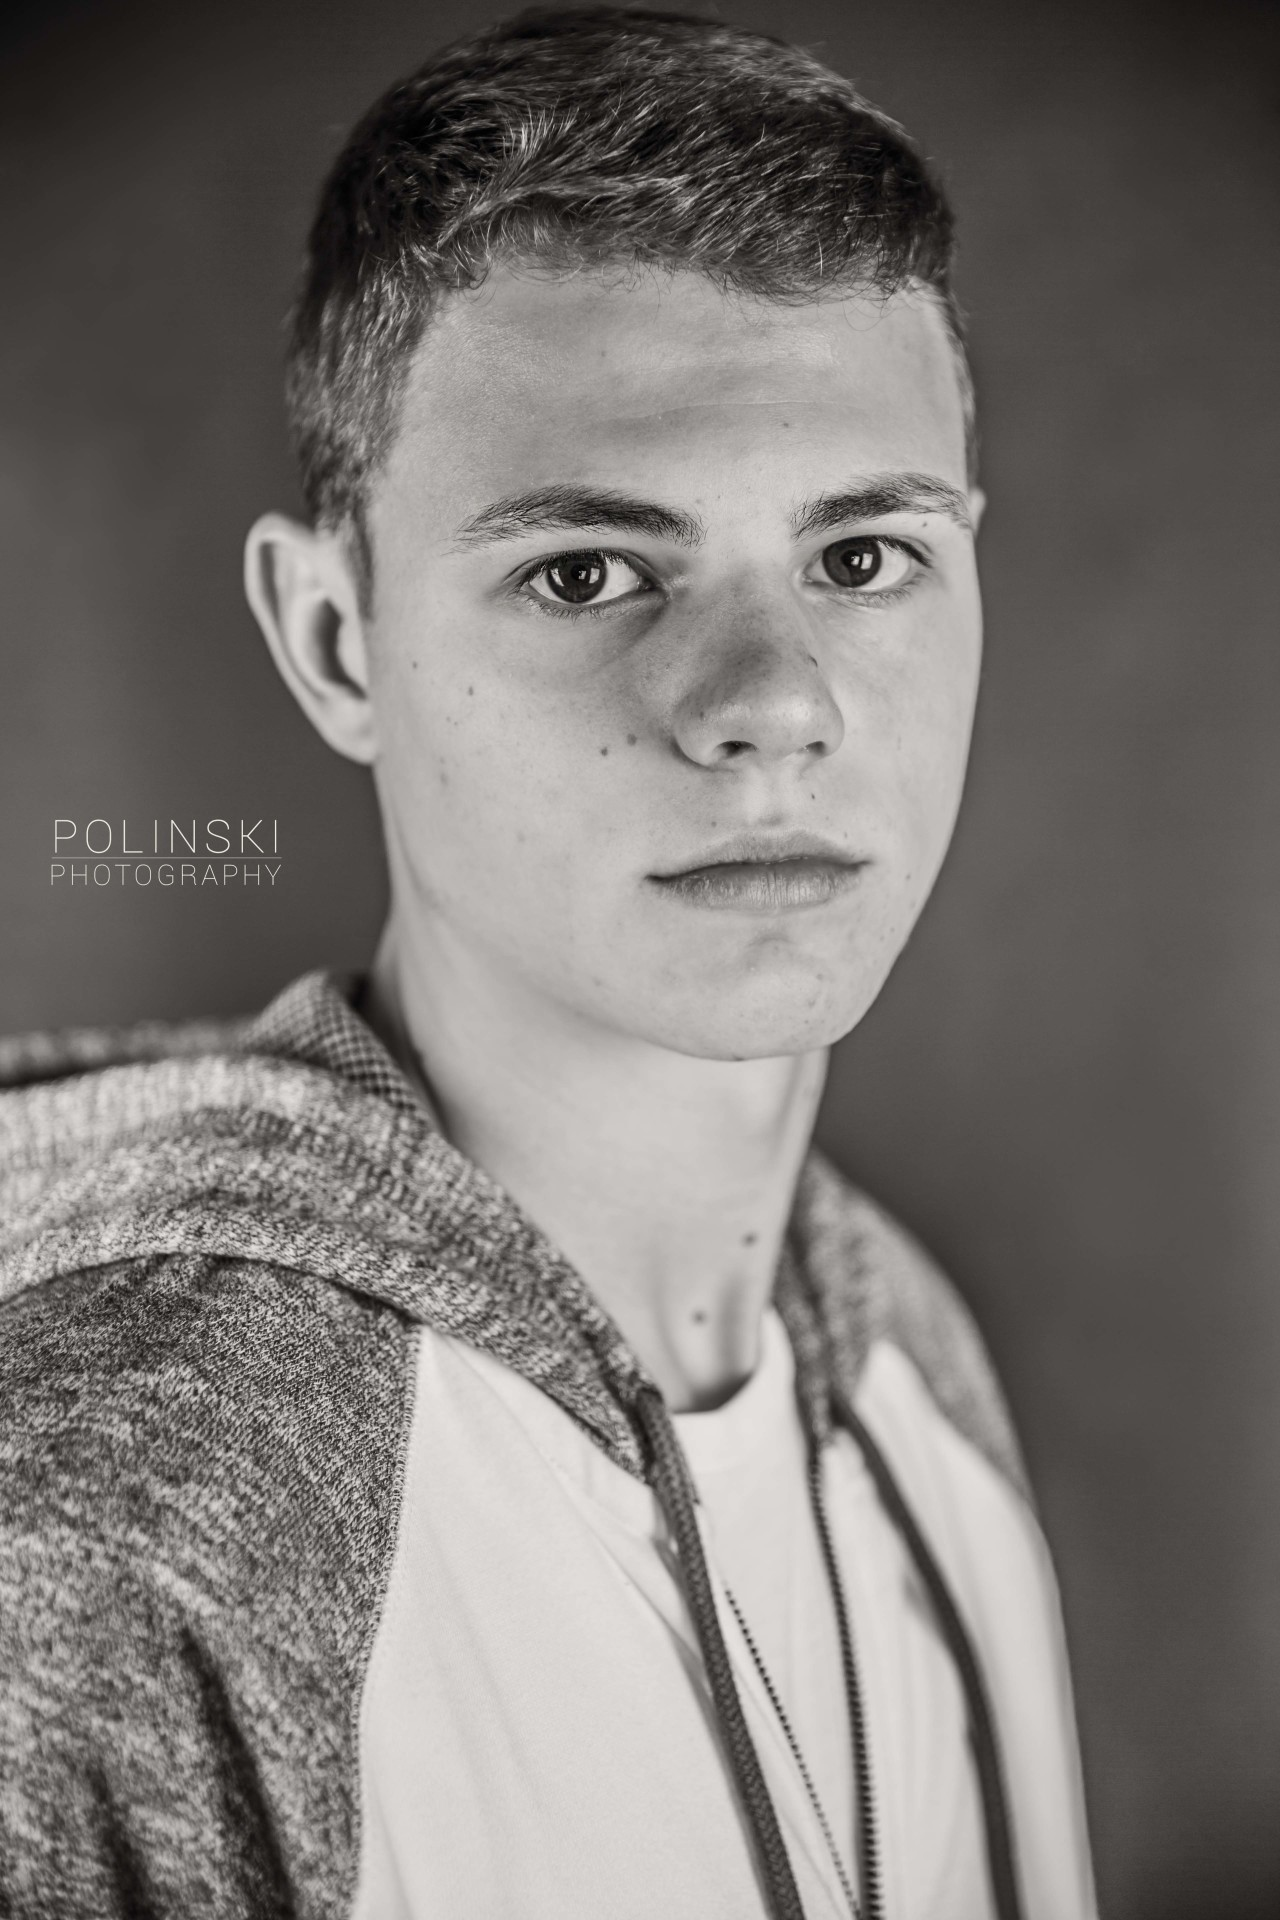 © Polinski Photography